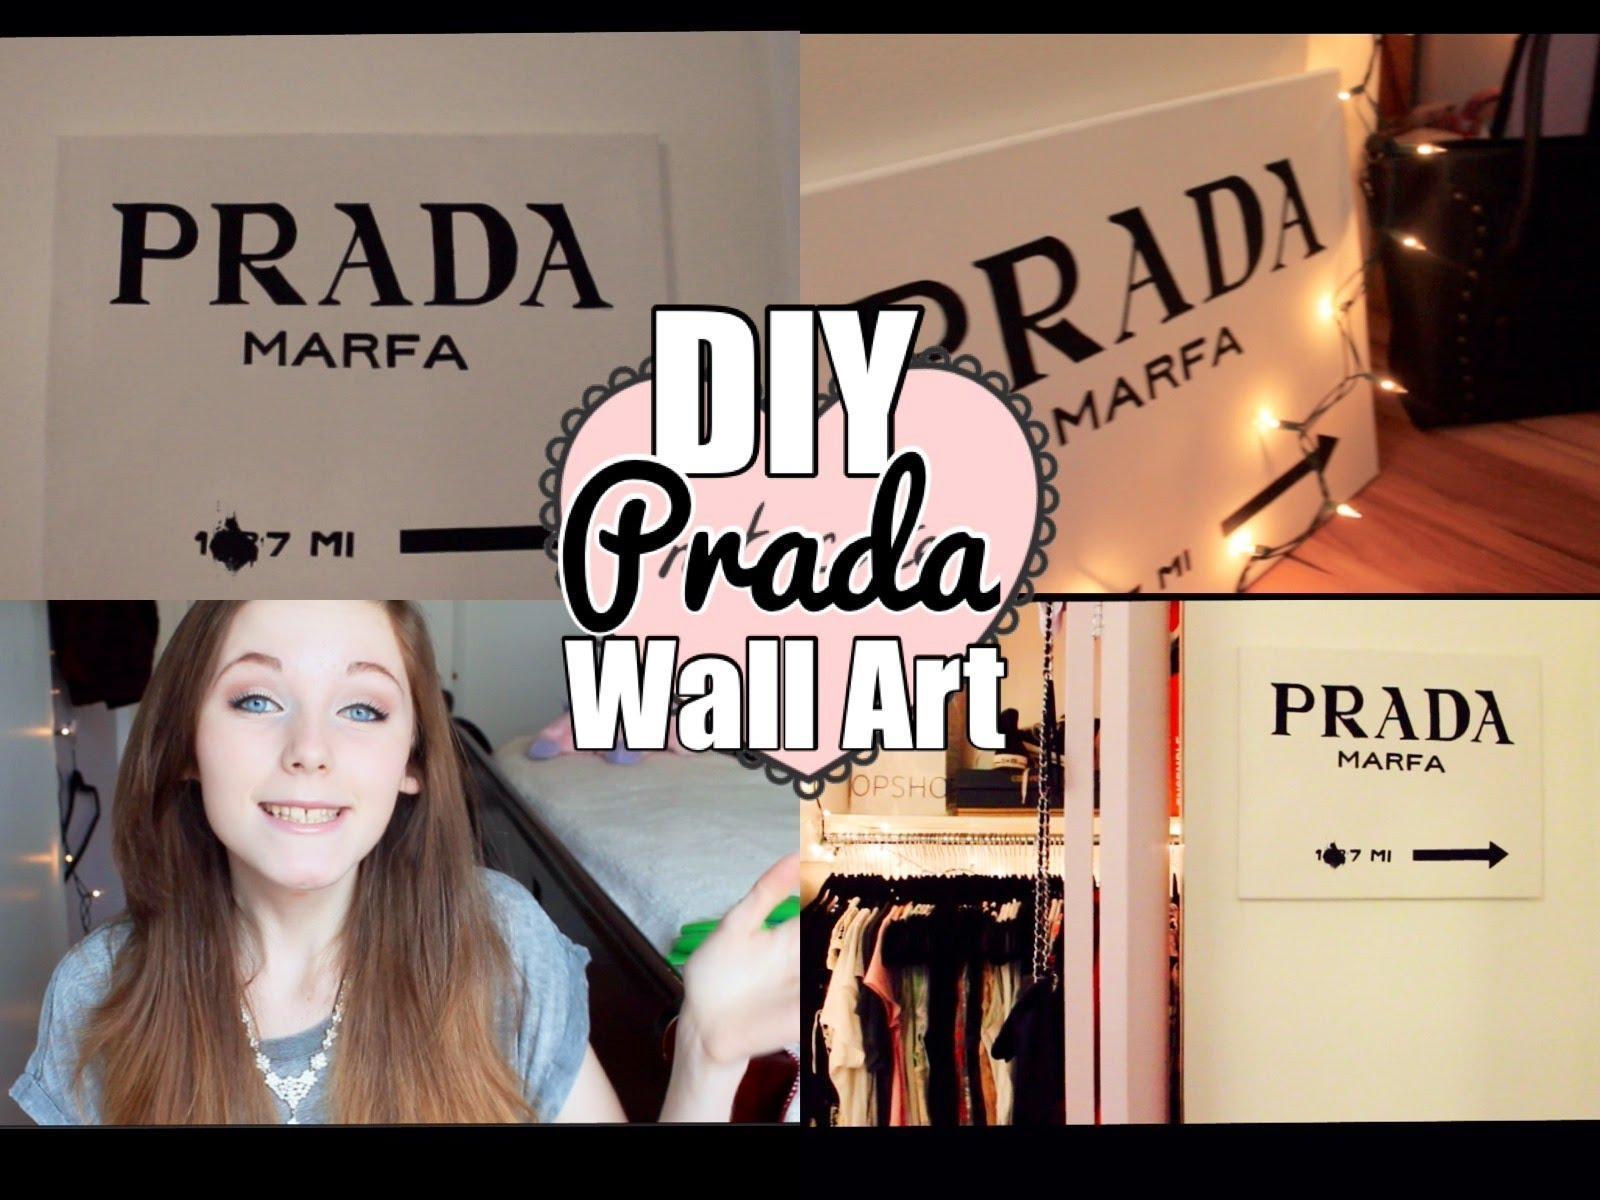 Diy Prada Wall Art ♡ – Youtube Inside Prada Wall Art (Photo 6 of 20)